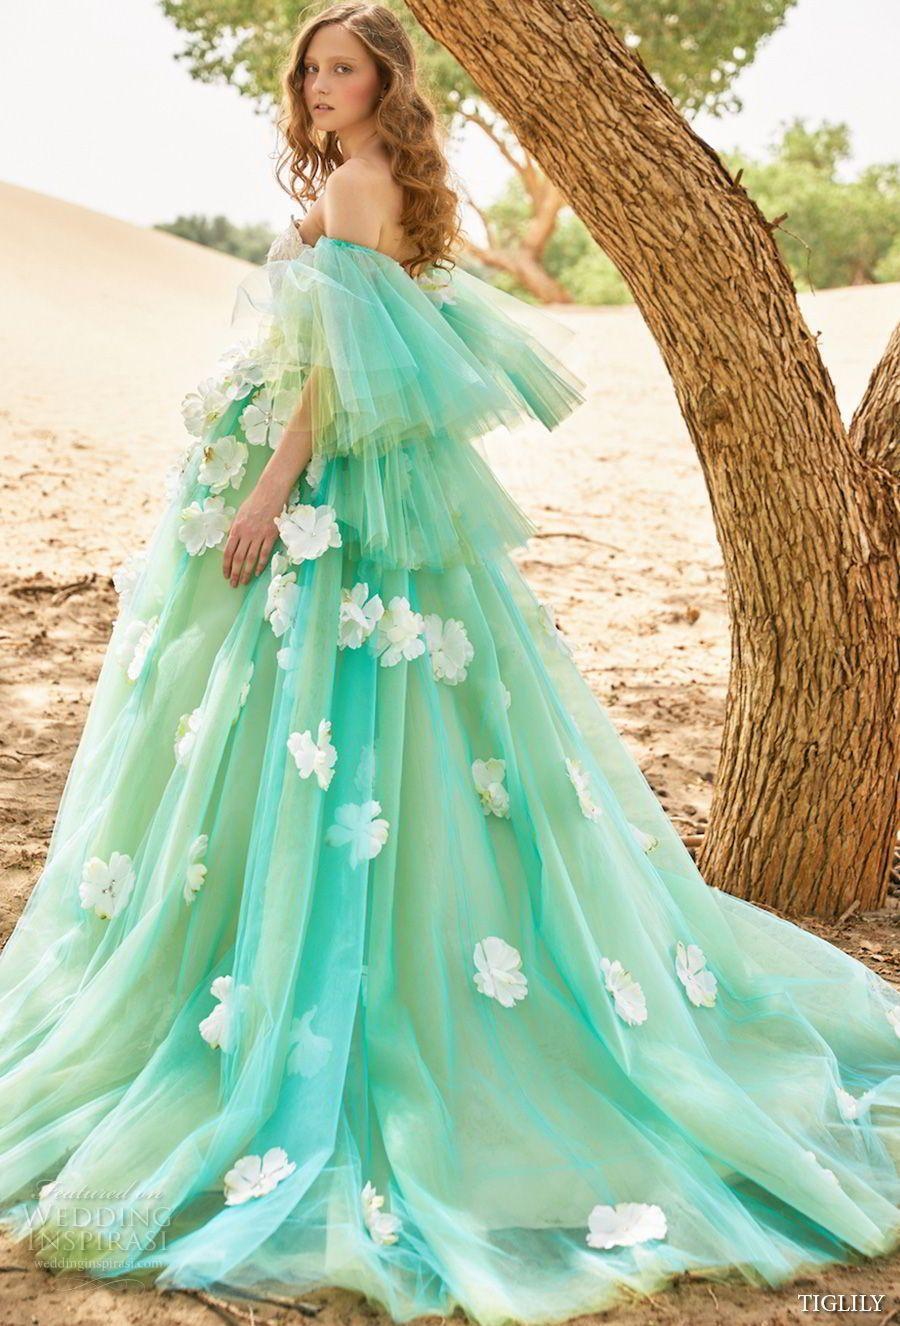 Tiglily bridal strapless full embellishment princess green